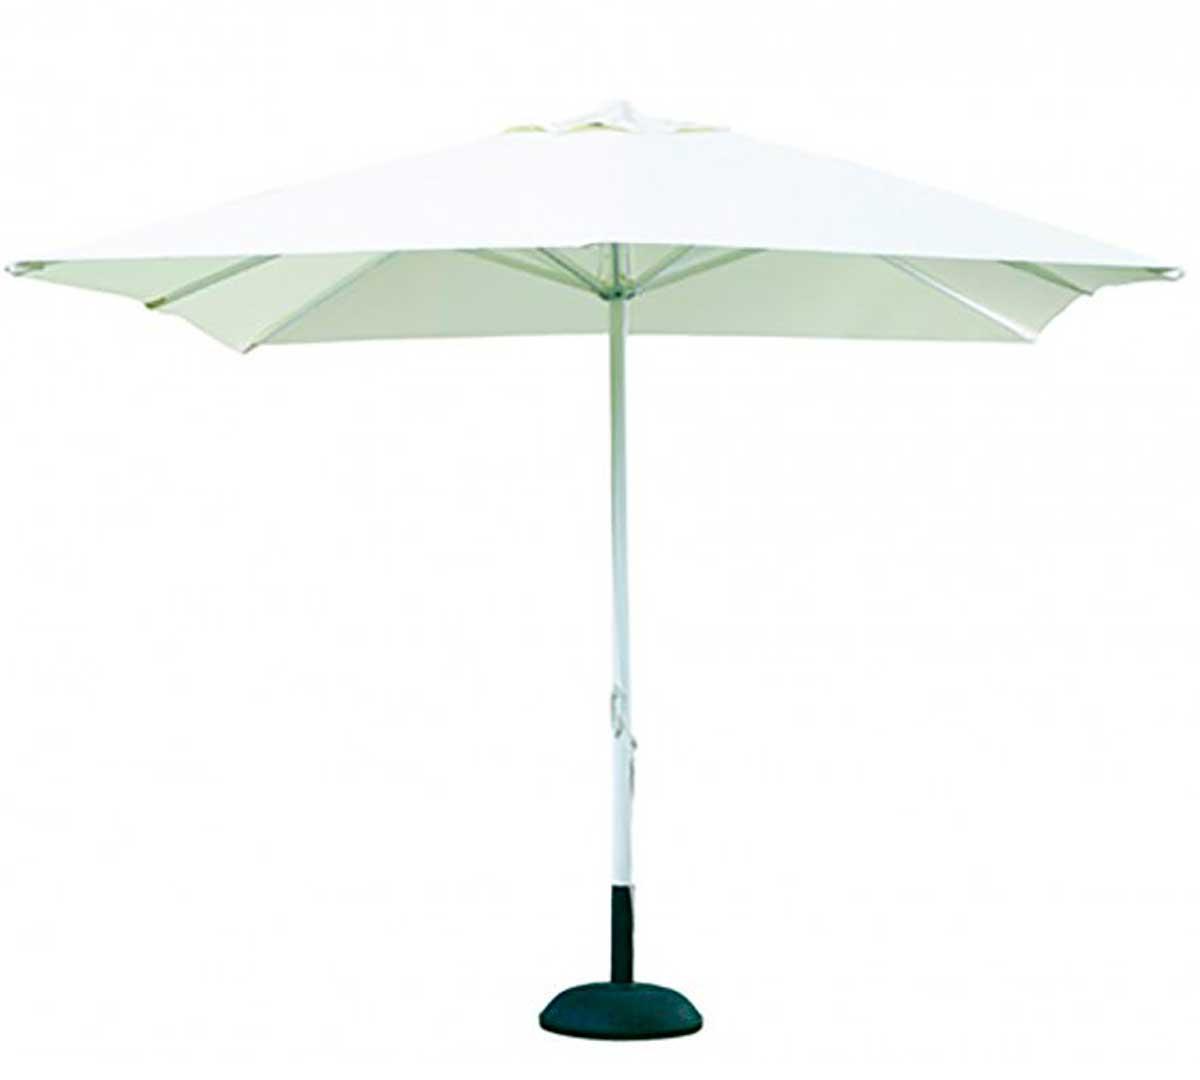 Parasol a1 de resol for Recambio tela parasol 3x3